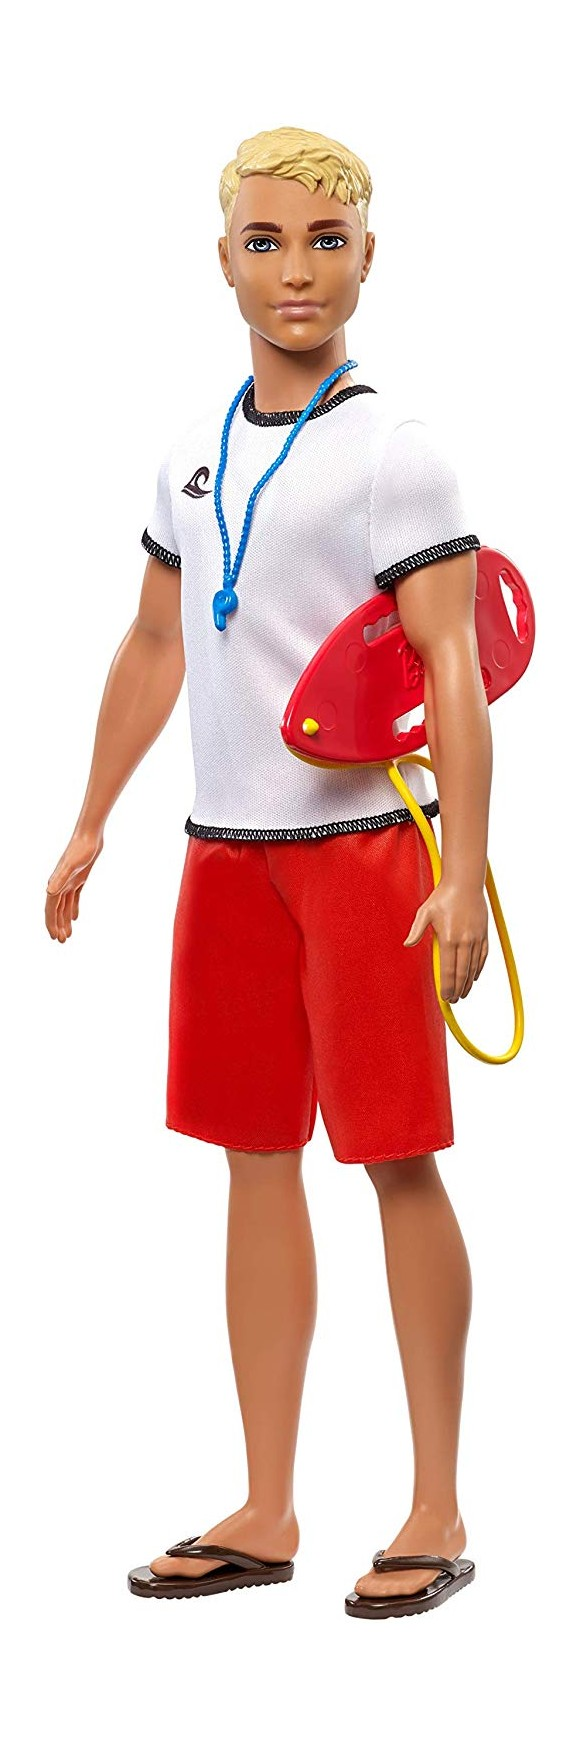 Barbie - Ken Lifeguard Doll (FXP04)